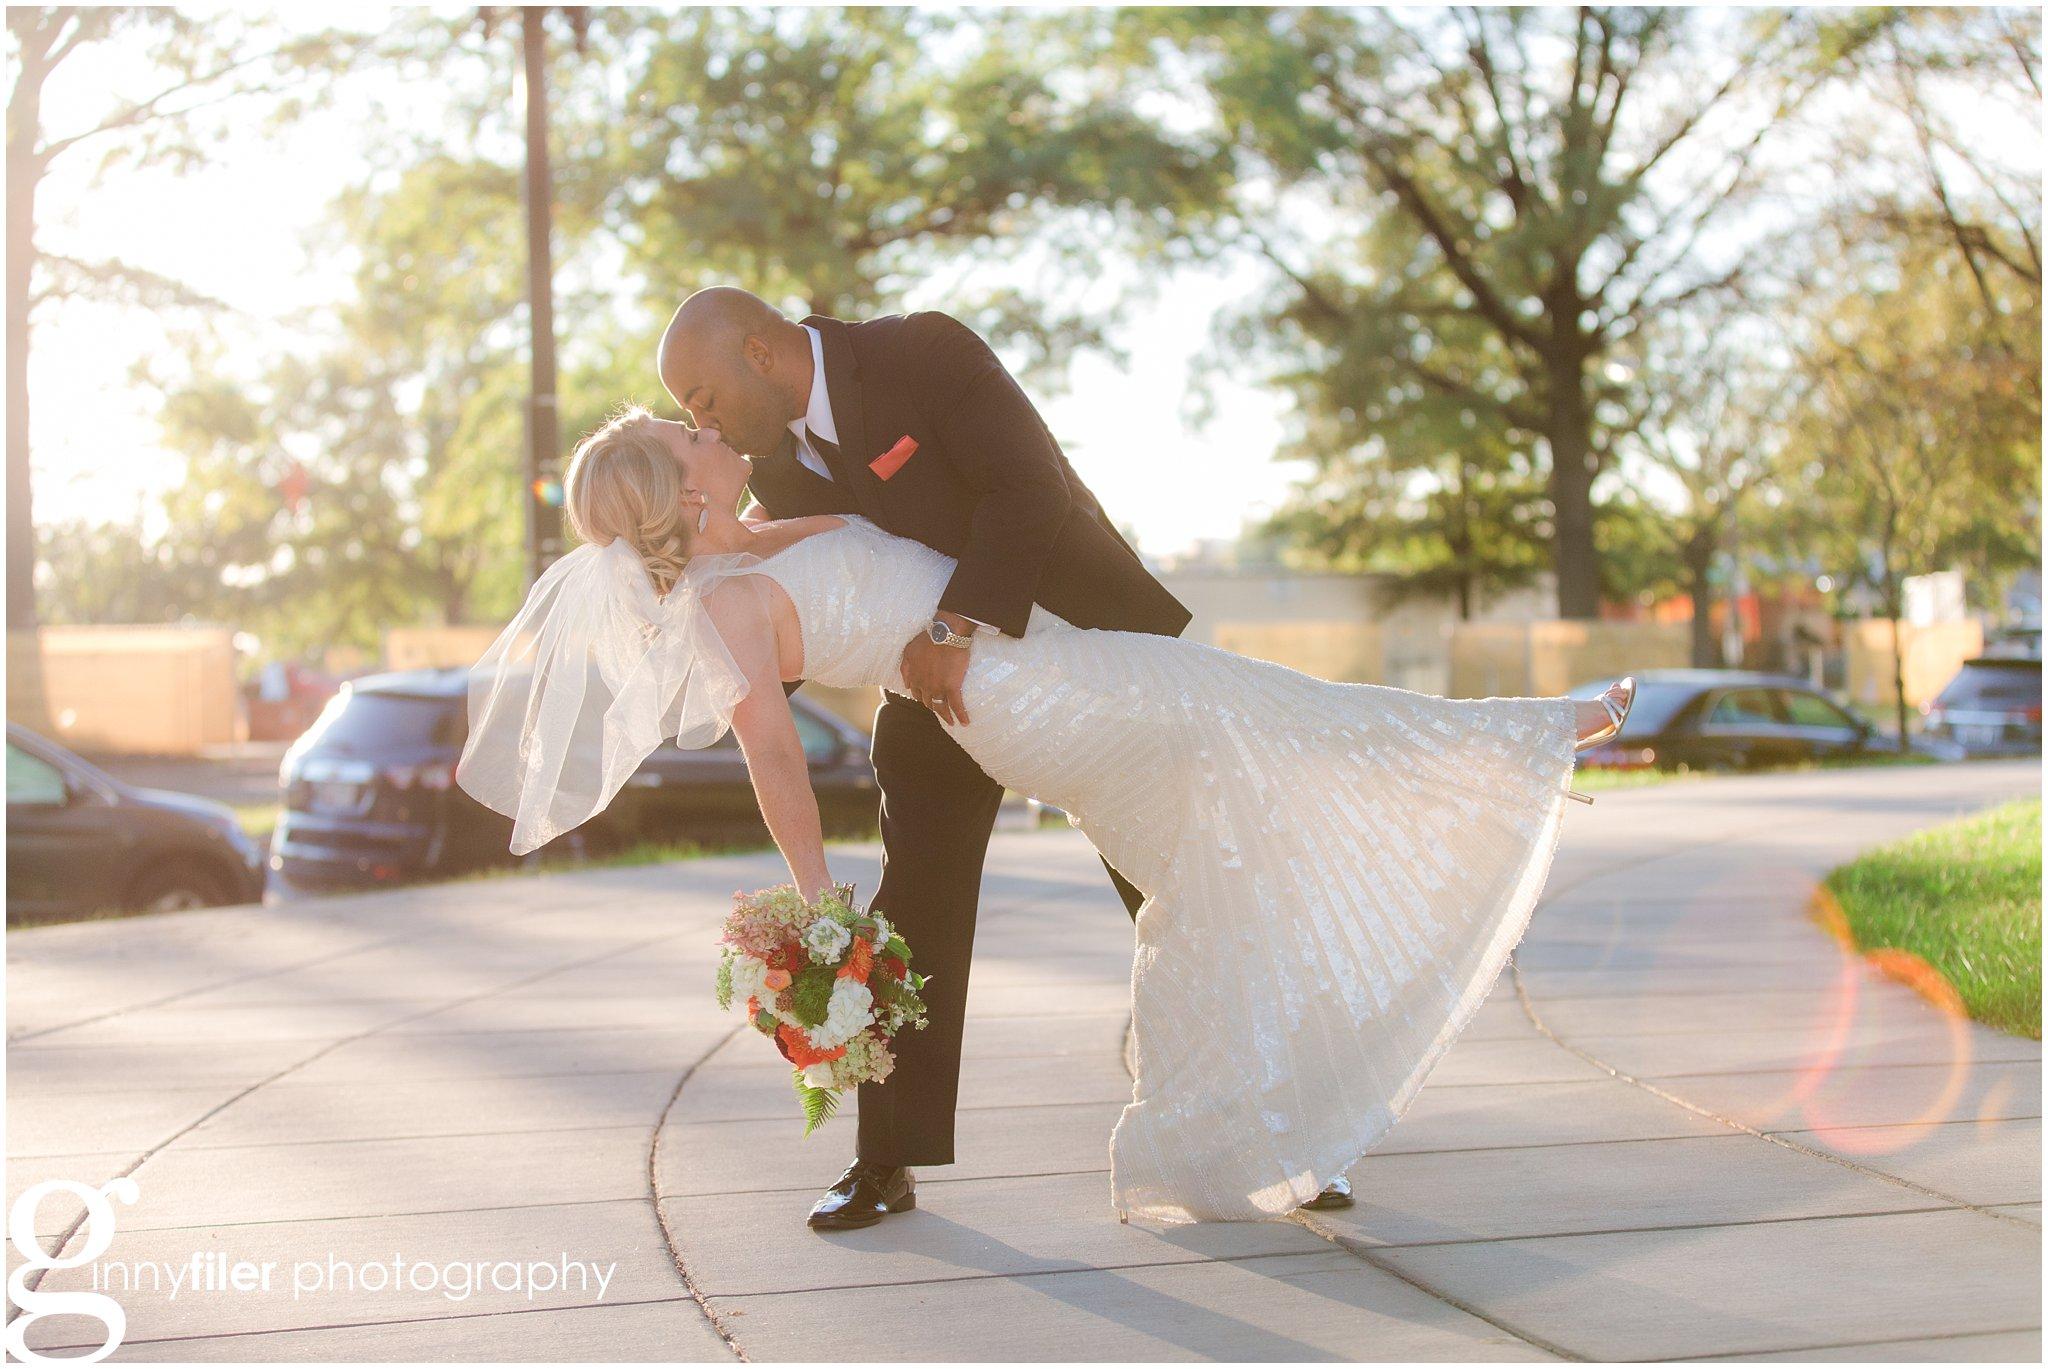 wedding_photography_bobb_0013.jpg